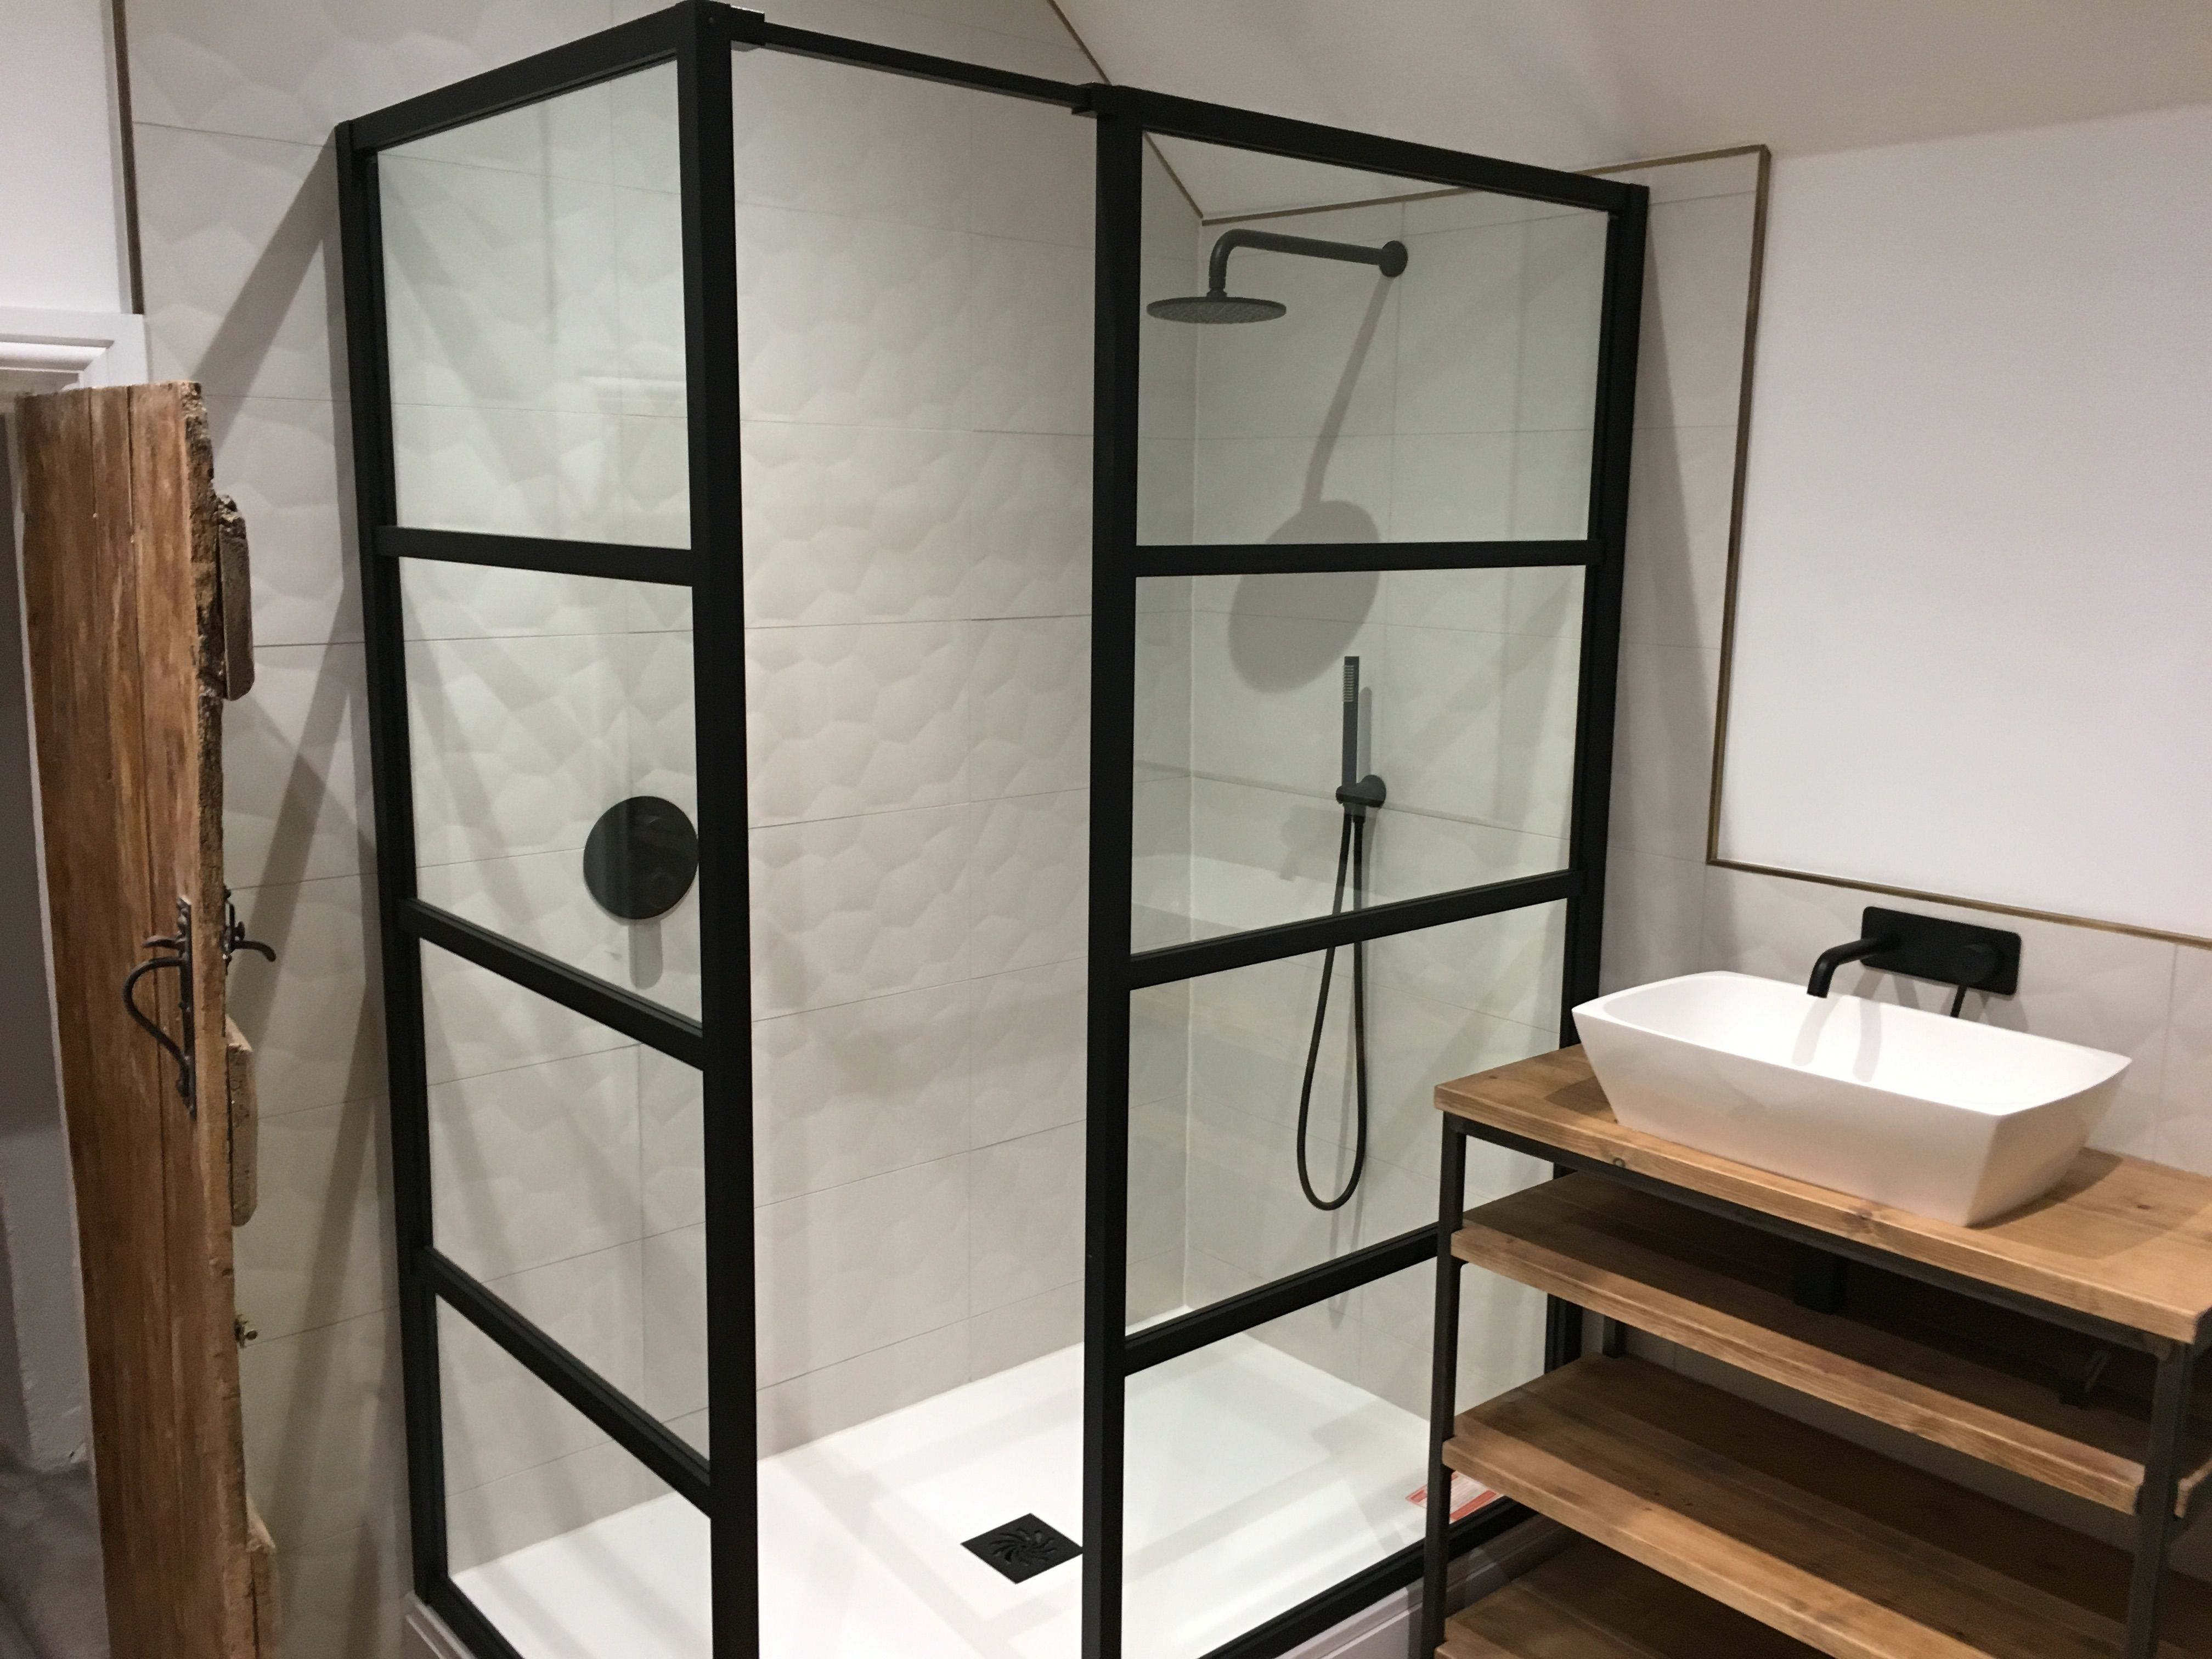 Industrial Bathroom Vanity Unit Washstand Bespoke Bathroom Furniture Basin Unit In 2020 Bespoke Bathroom Industrial Bathroom Vanity Industrial Bathroom